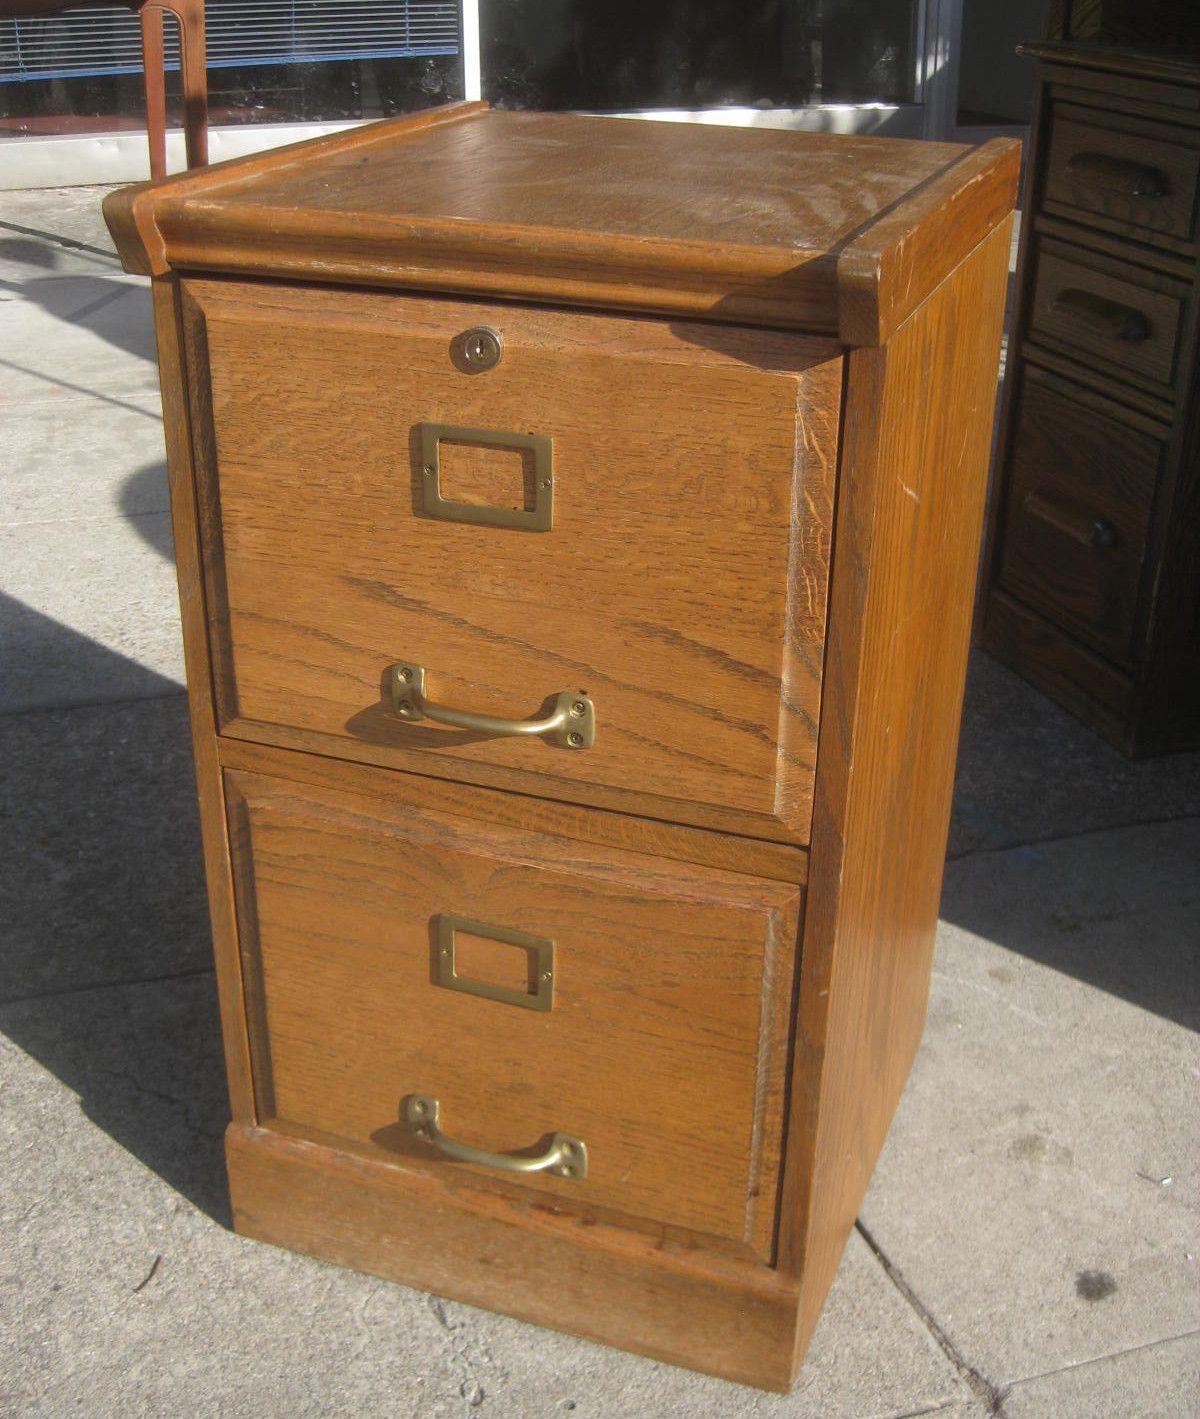 2019 2 Drawer Wooden Filing Cabinets For Home Kitchen Remodeling